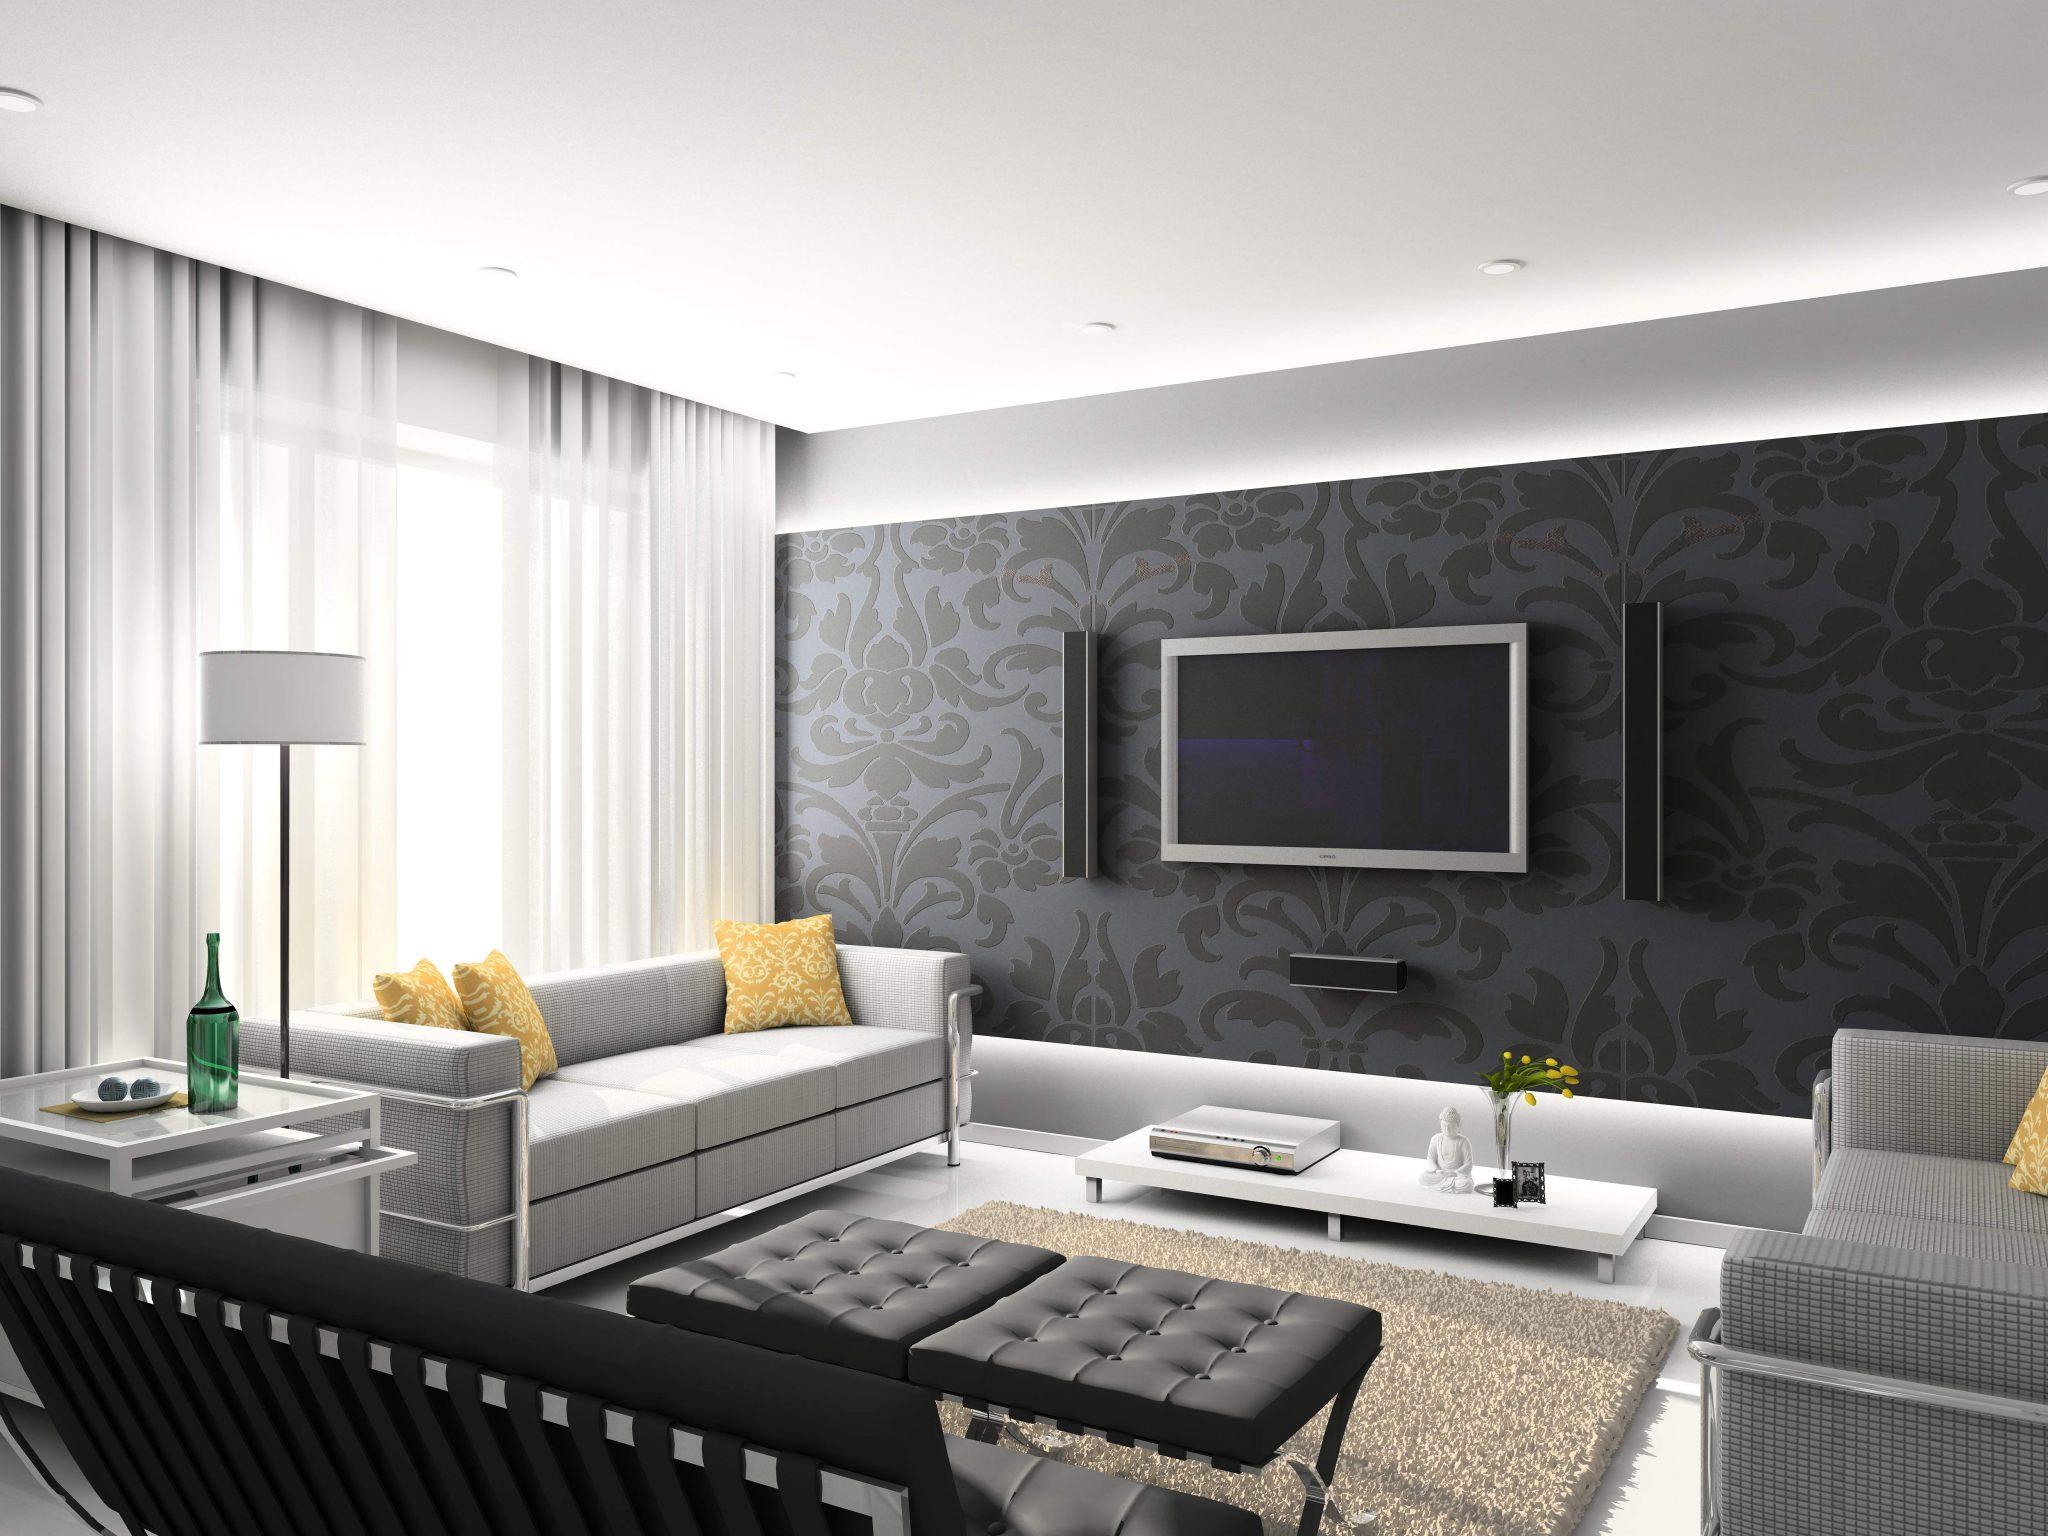 Modern-Living-Room-Home-Design-Ideas111